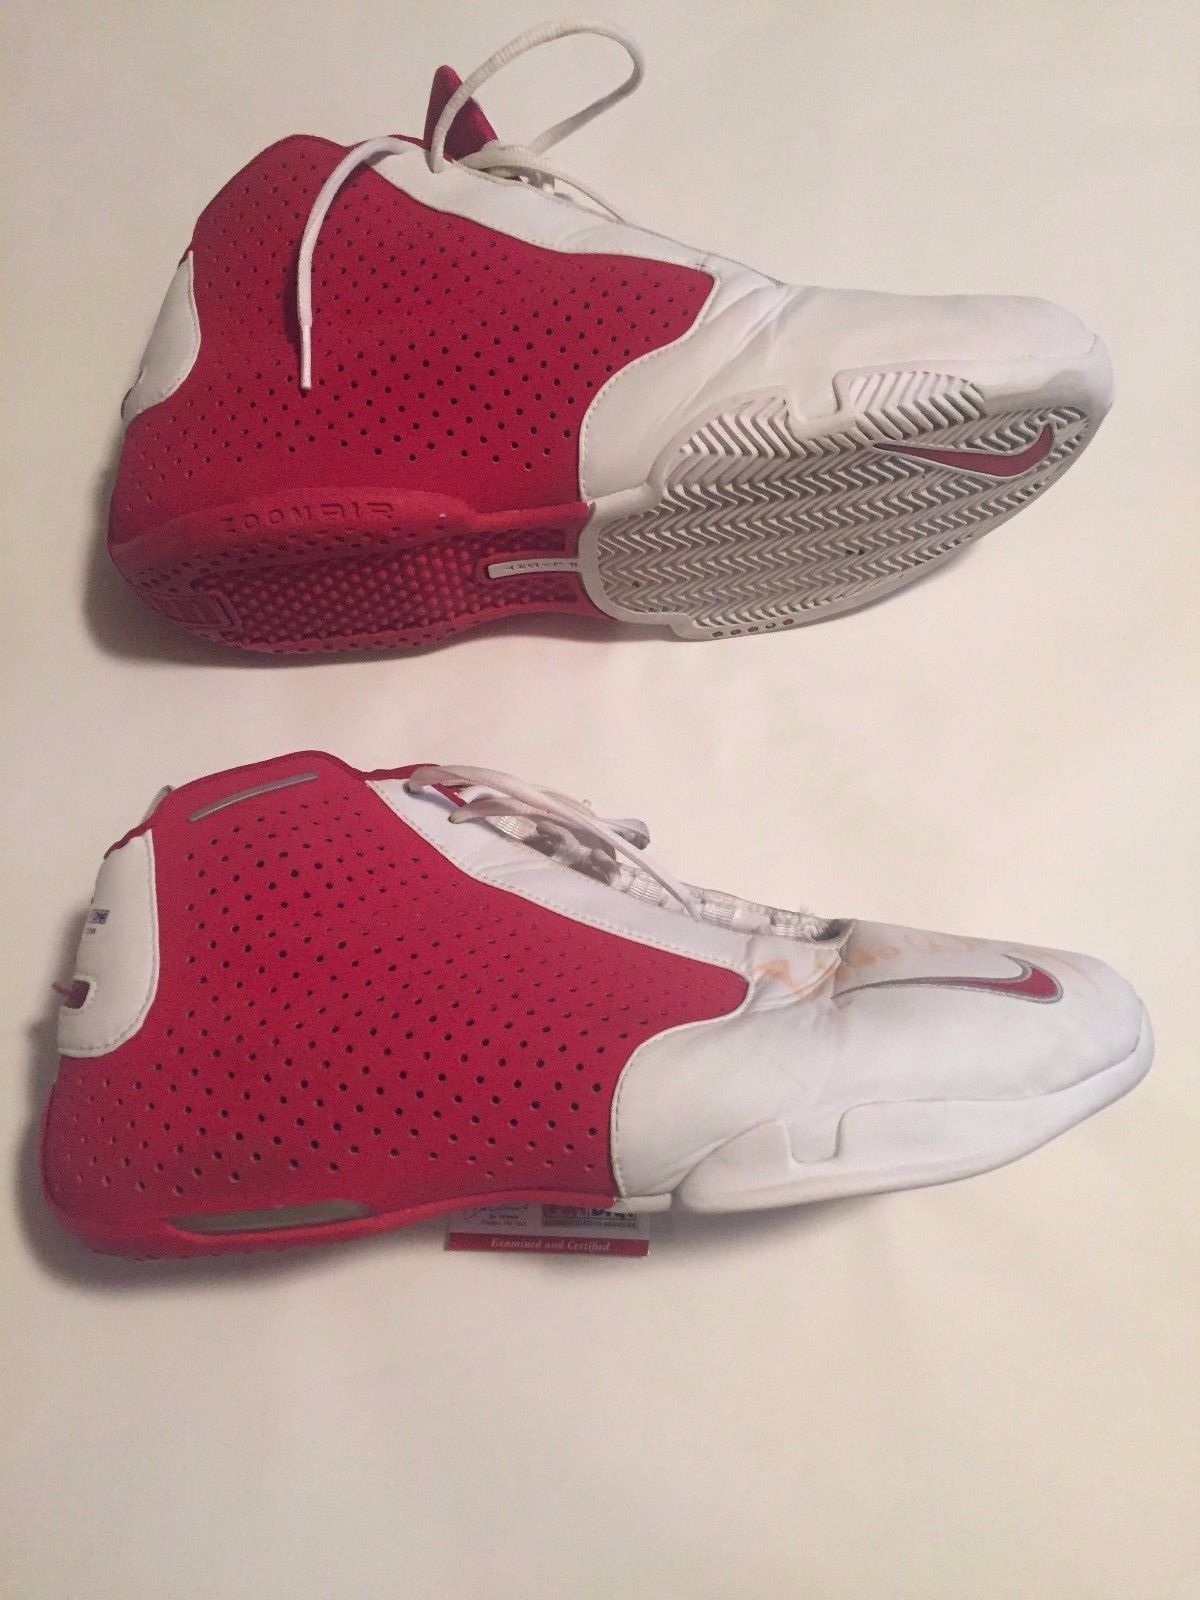 Bostjan Nachbar Autographed Houston Rockets Game Used Shoes 2 AUTO'S PSA COA